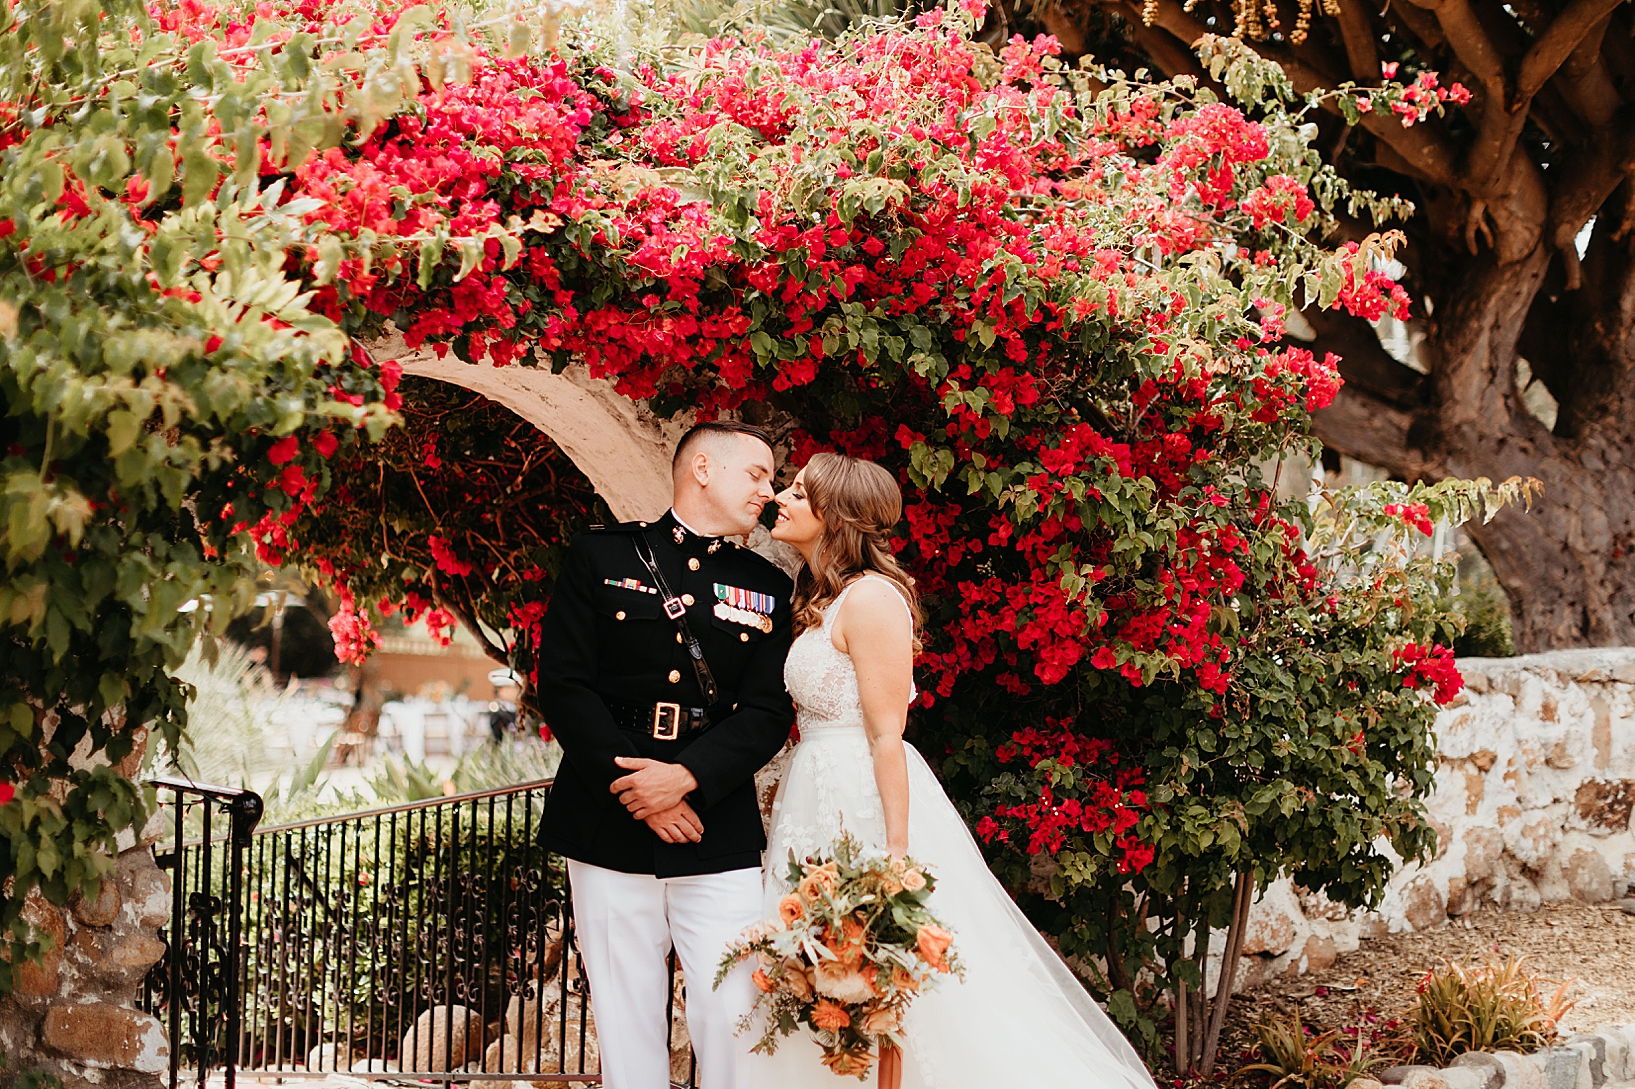 Leo-Carrillo-Ranch-Wedding-33.jpg